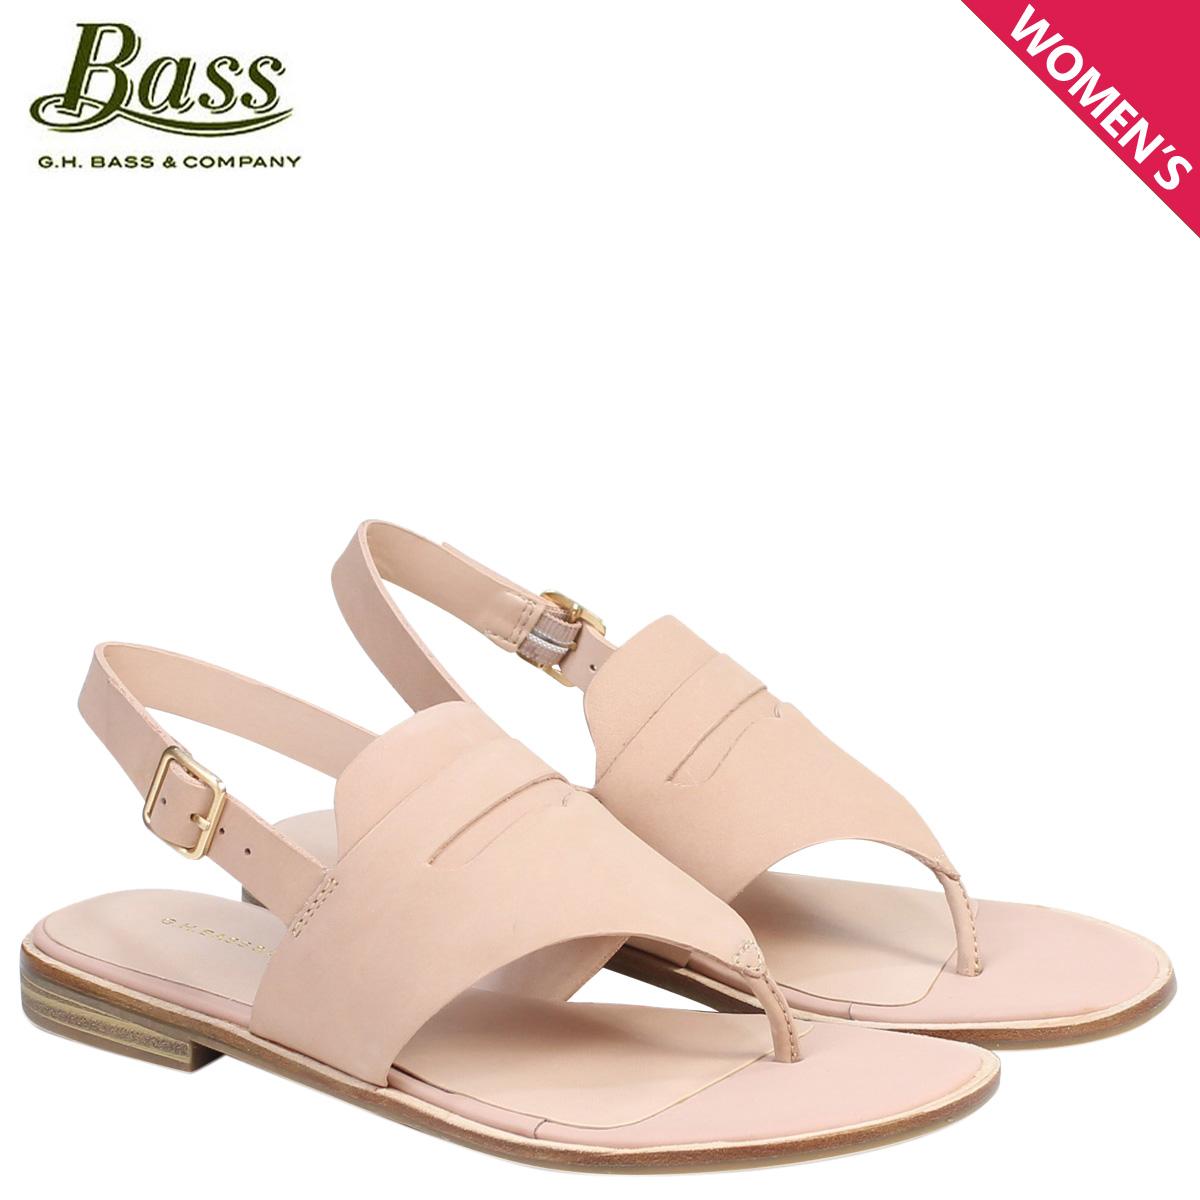 G.H. BASS サンダル レディース ジーエイチバス トング アンクルストラップ MADDIE THONG SANDAL 71-20331 靴 ピンク